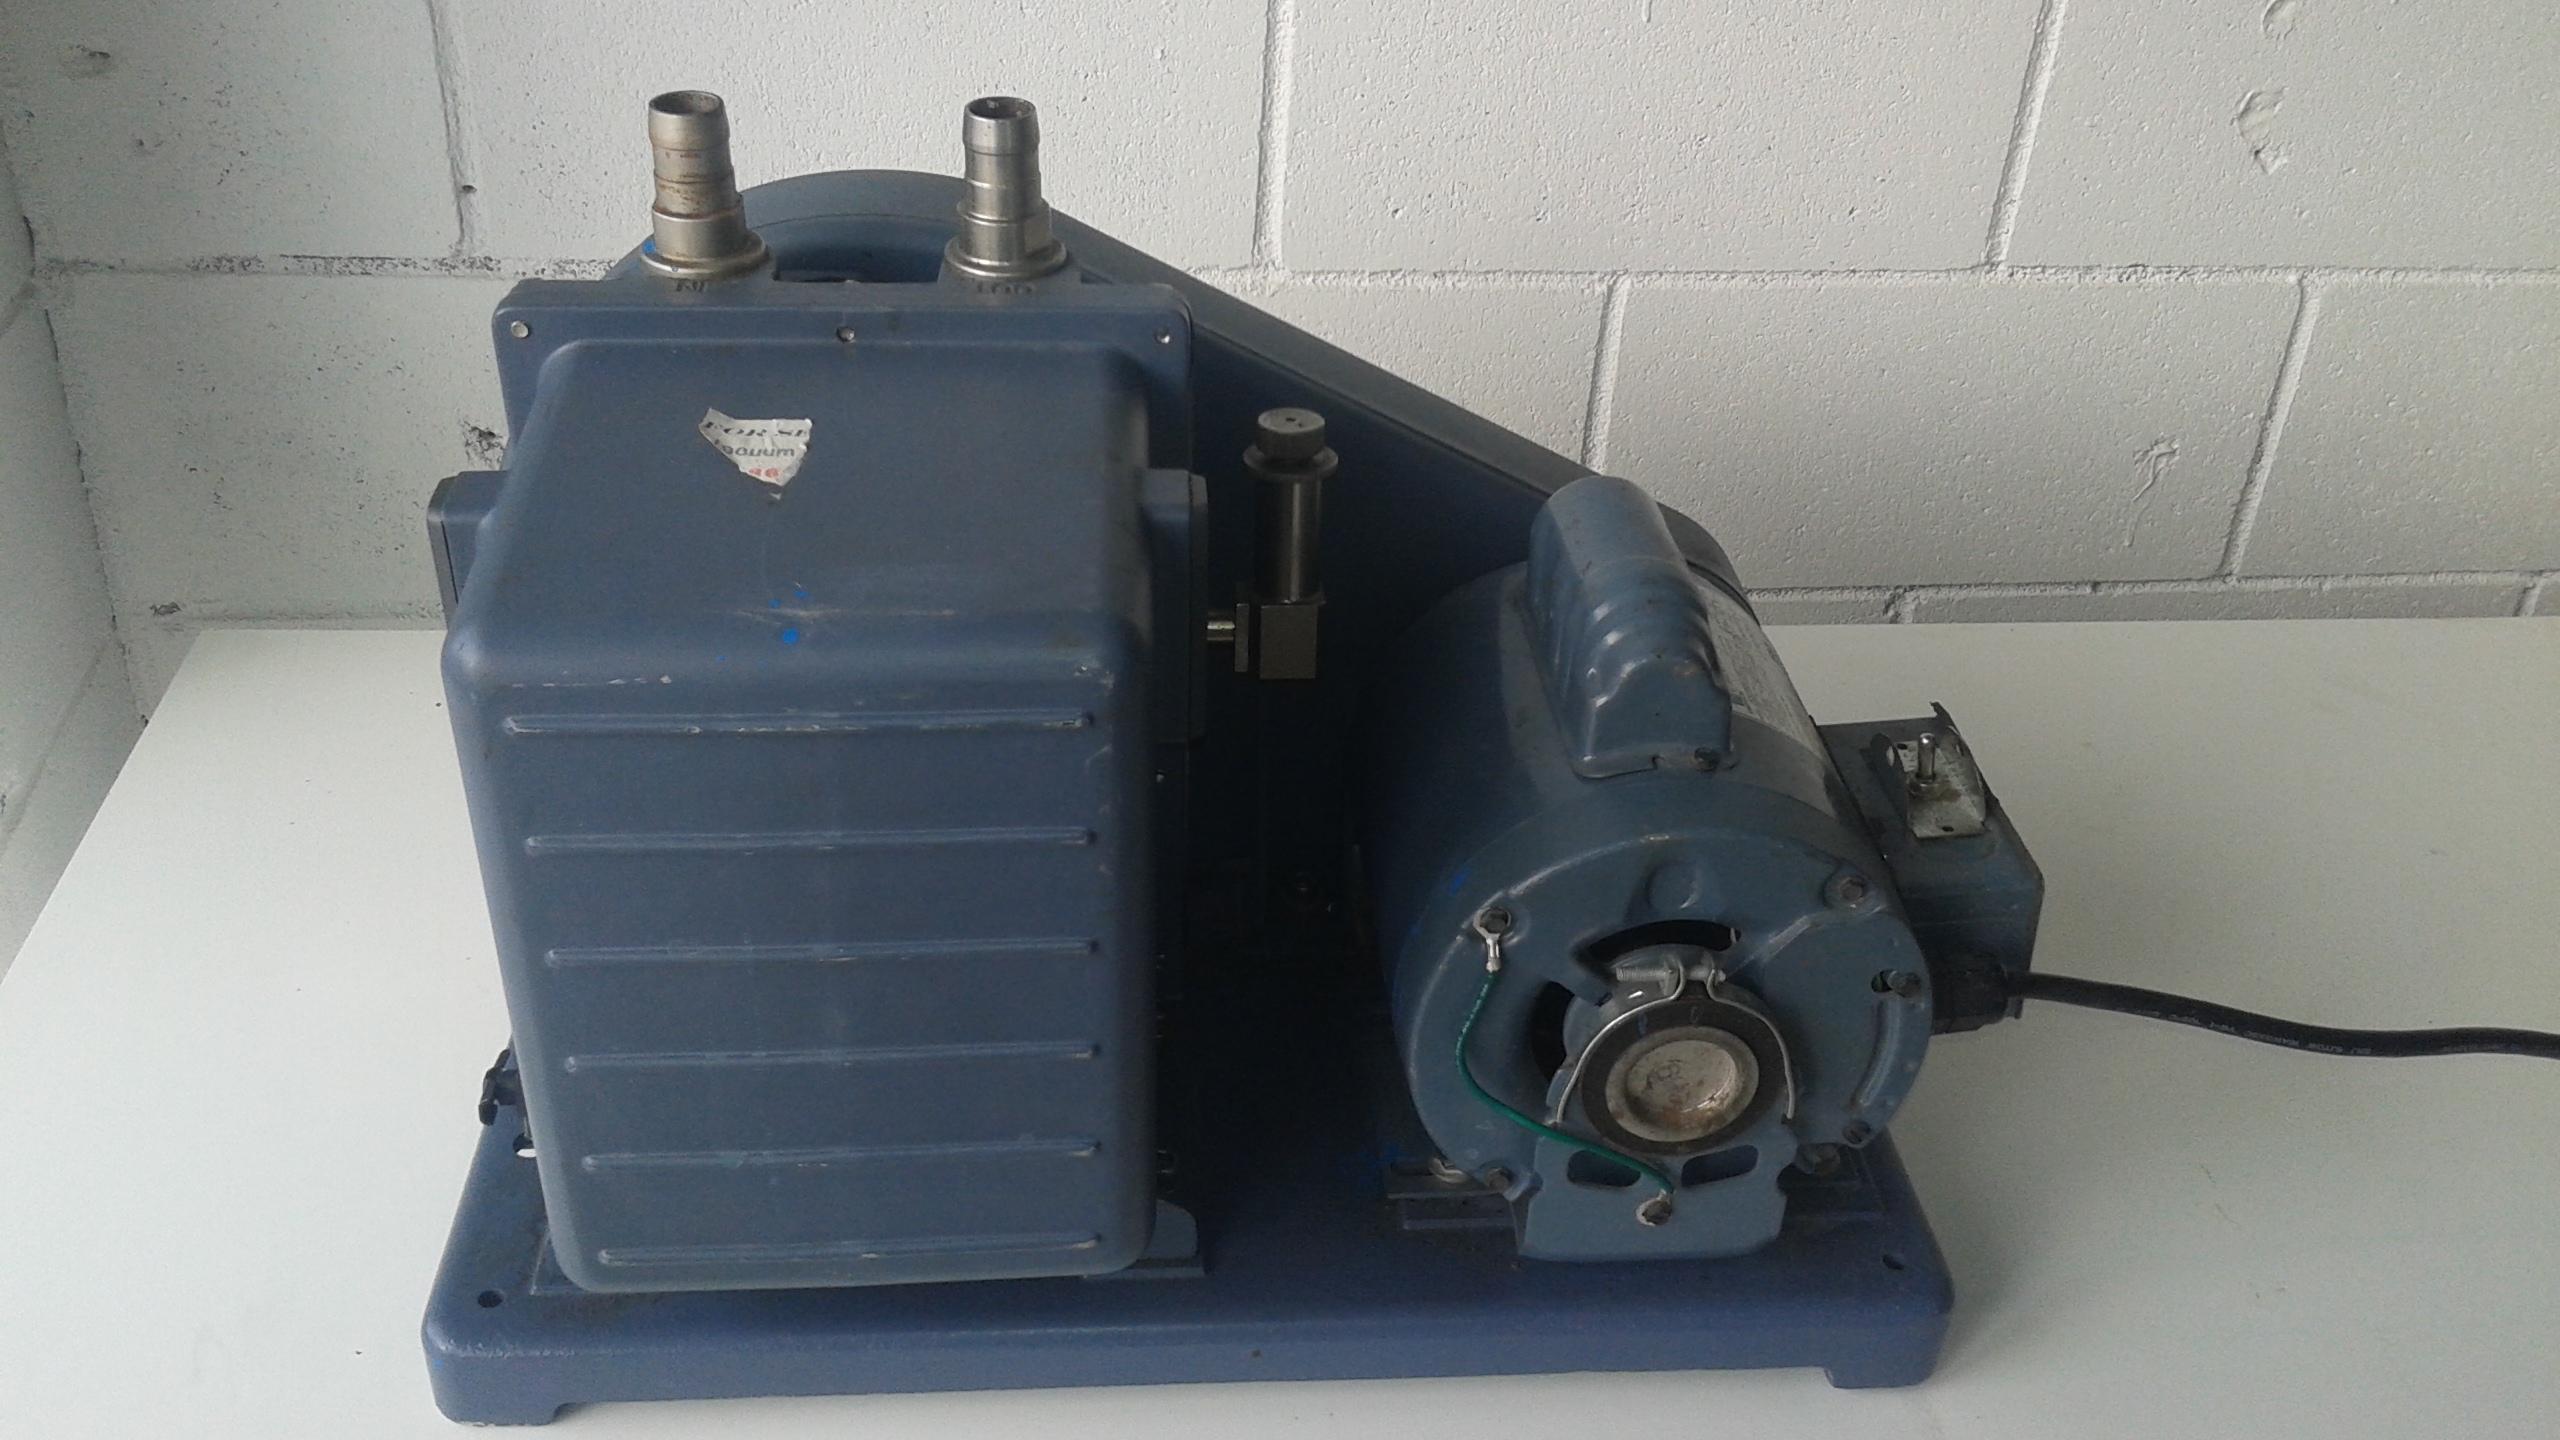 Welch Model 1402 Duo-Seal Vacuum Pump - LOCATION - LONDON, ONTARIO